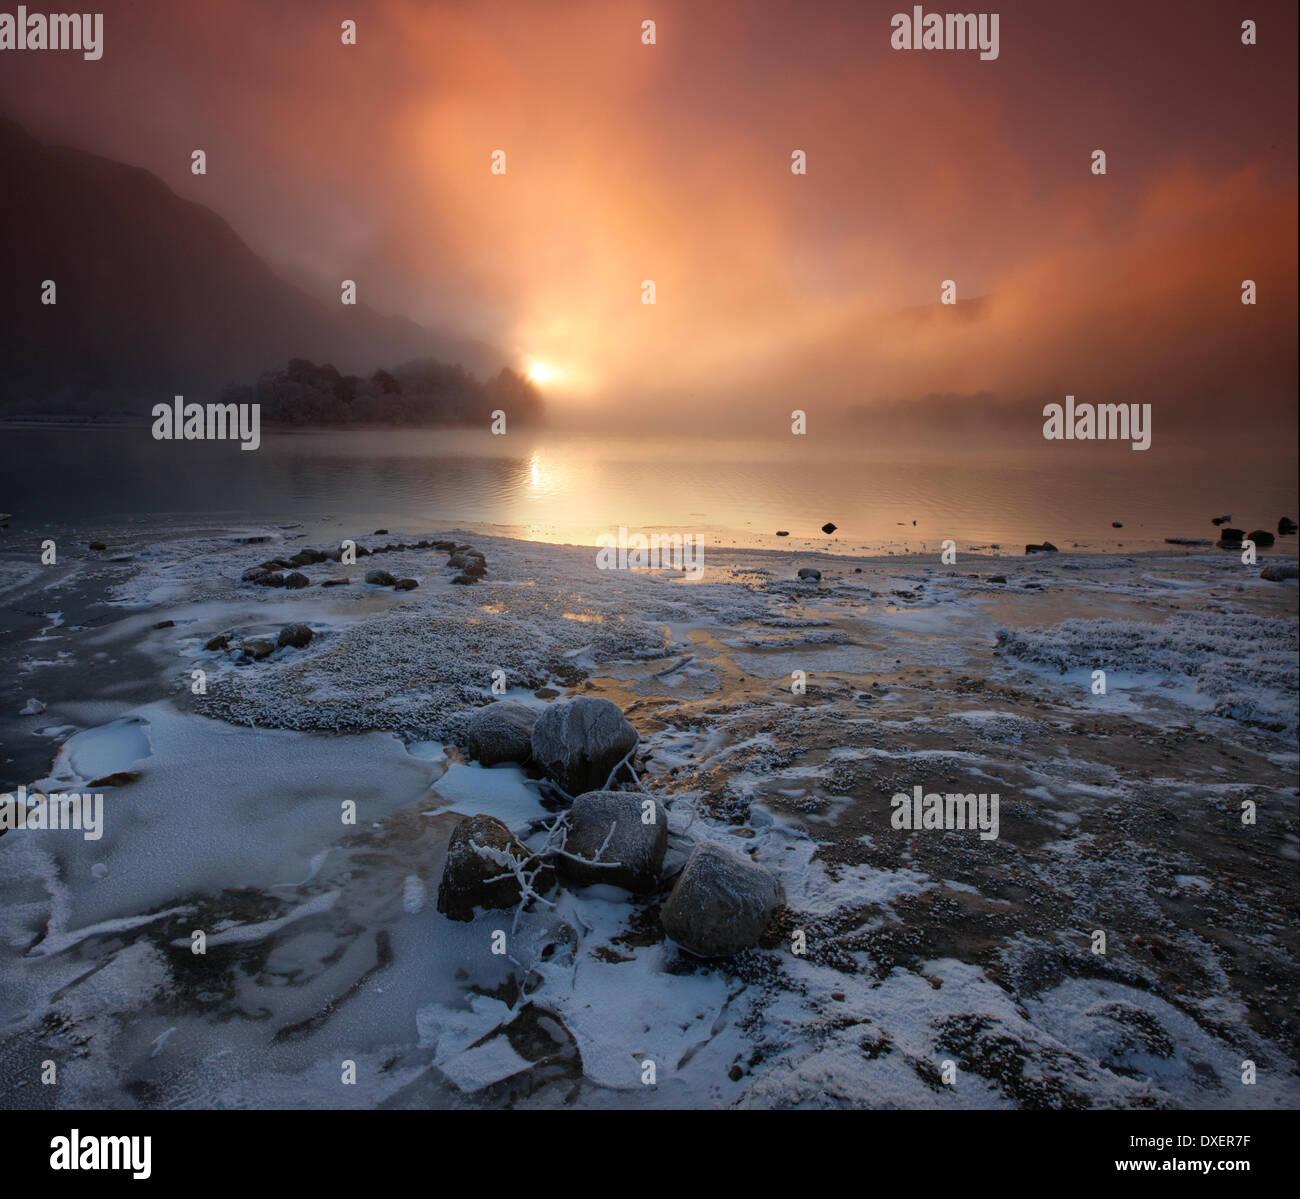 Winter sunset over Loch Shiel, Lochaber - Stock Image